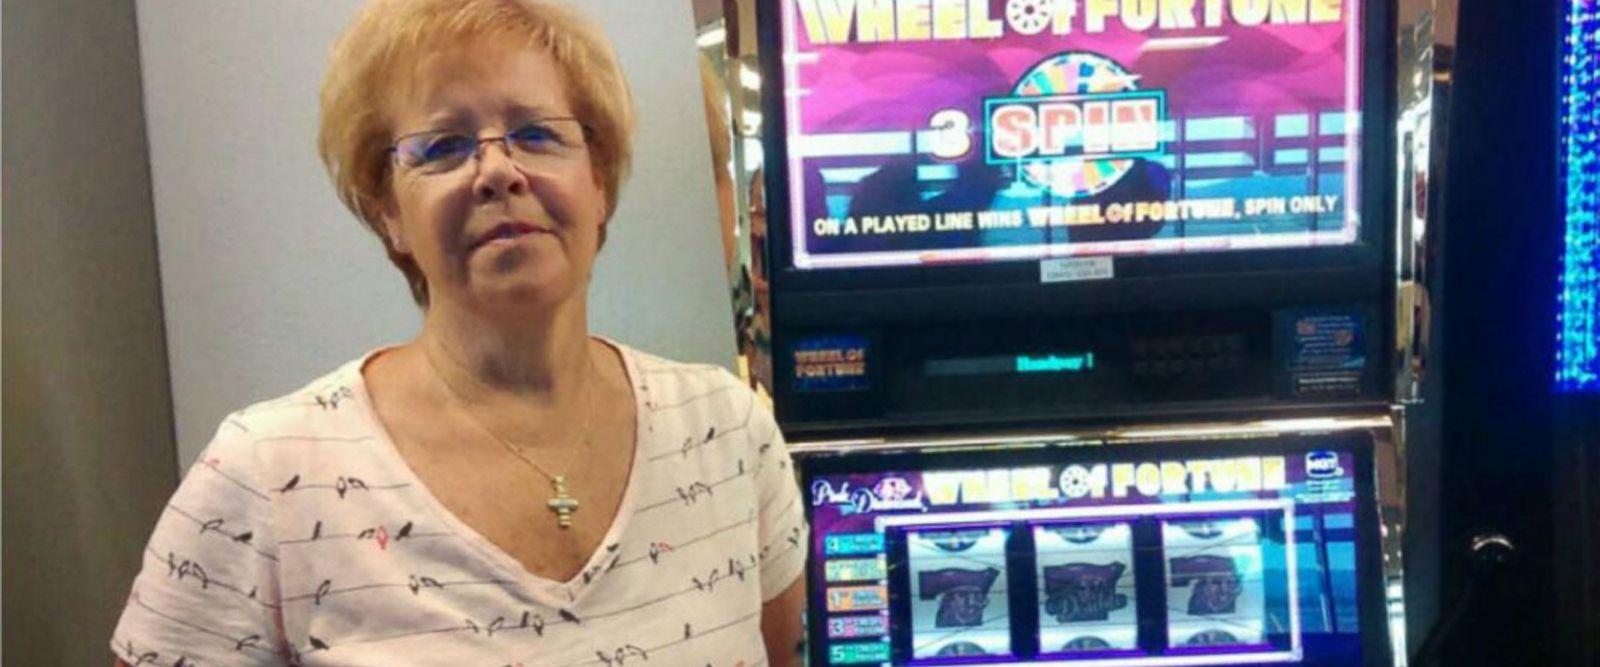 VIDEO: Woman wins $1.6 million on Vegas airport slot machine